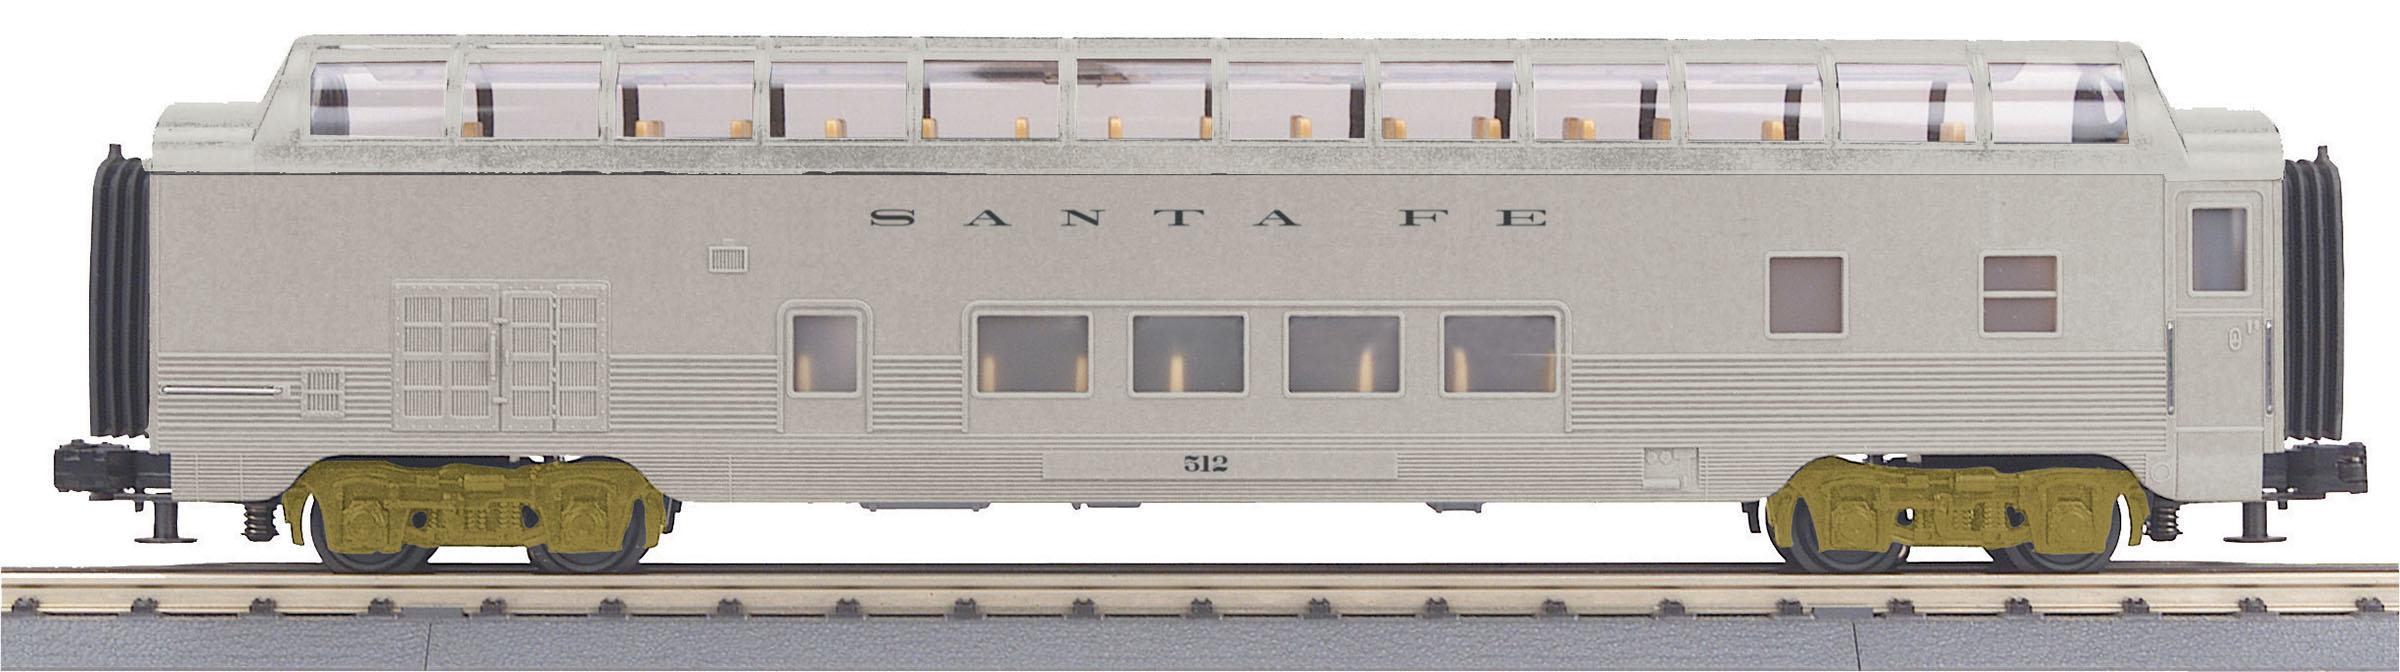 MTH 30-68155 60' Full Length Vista Dome 3 Rail RailKing Santa Fe